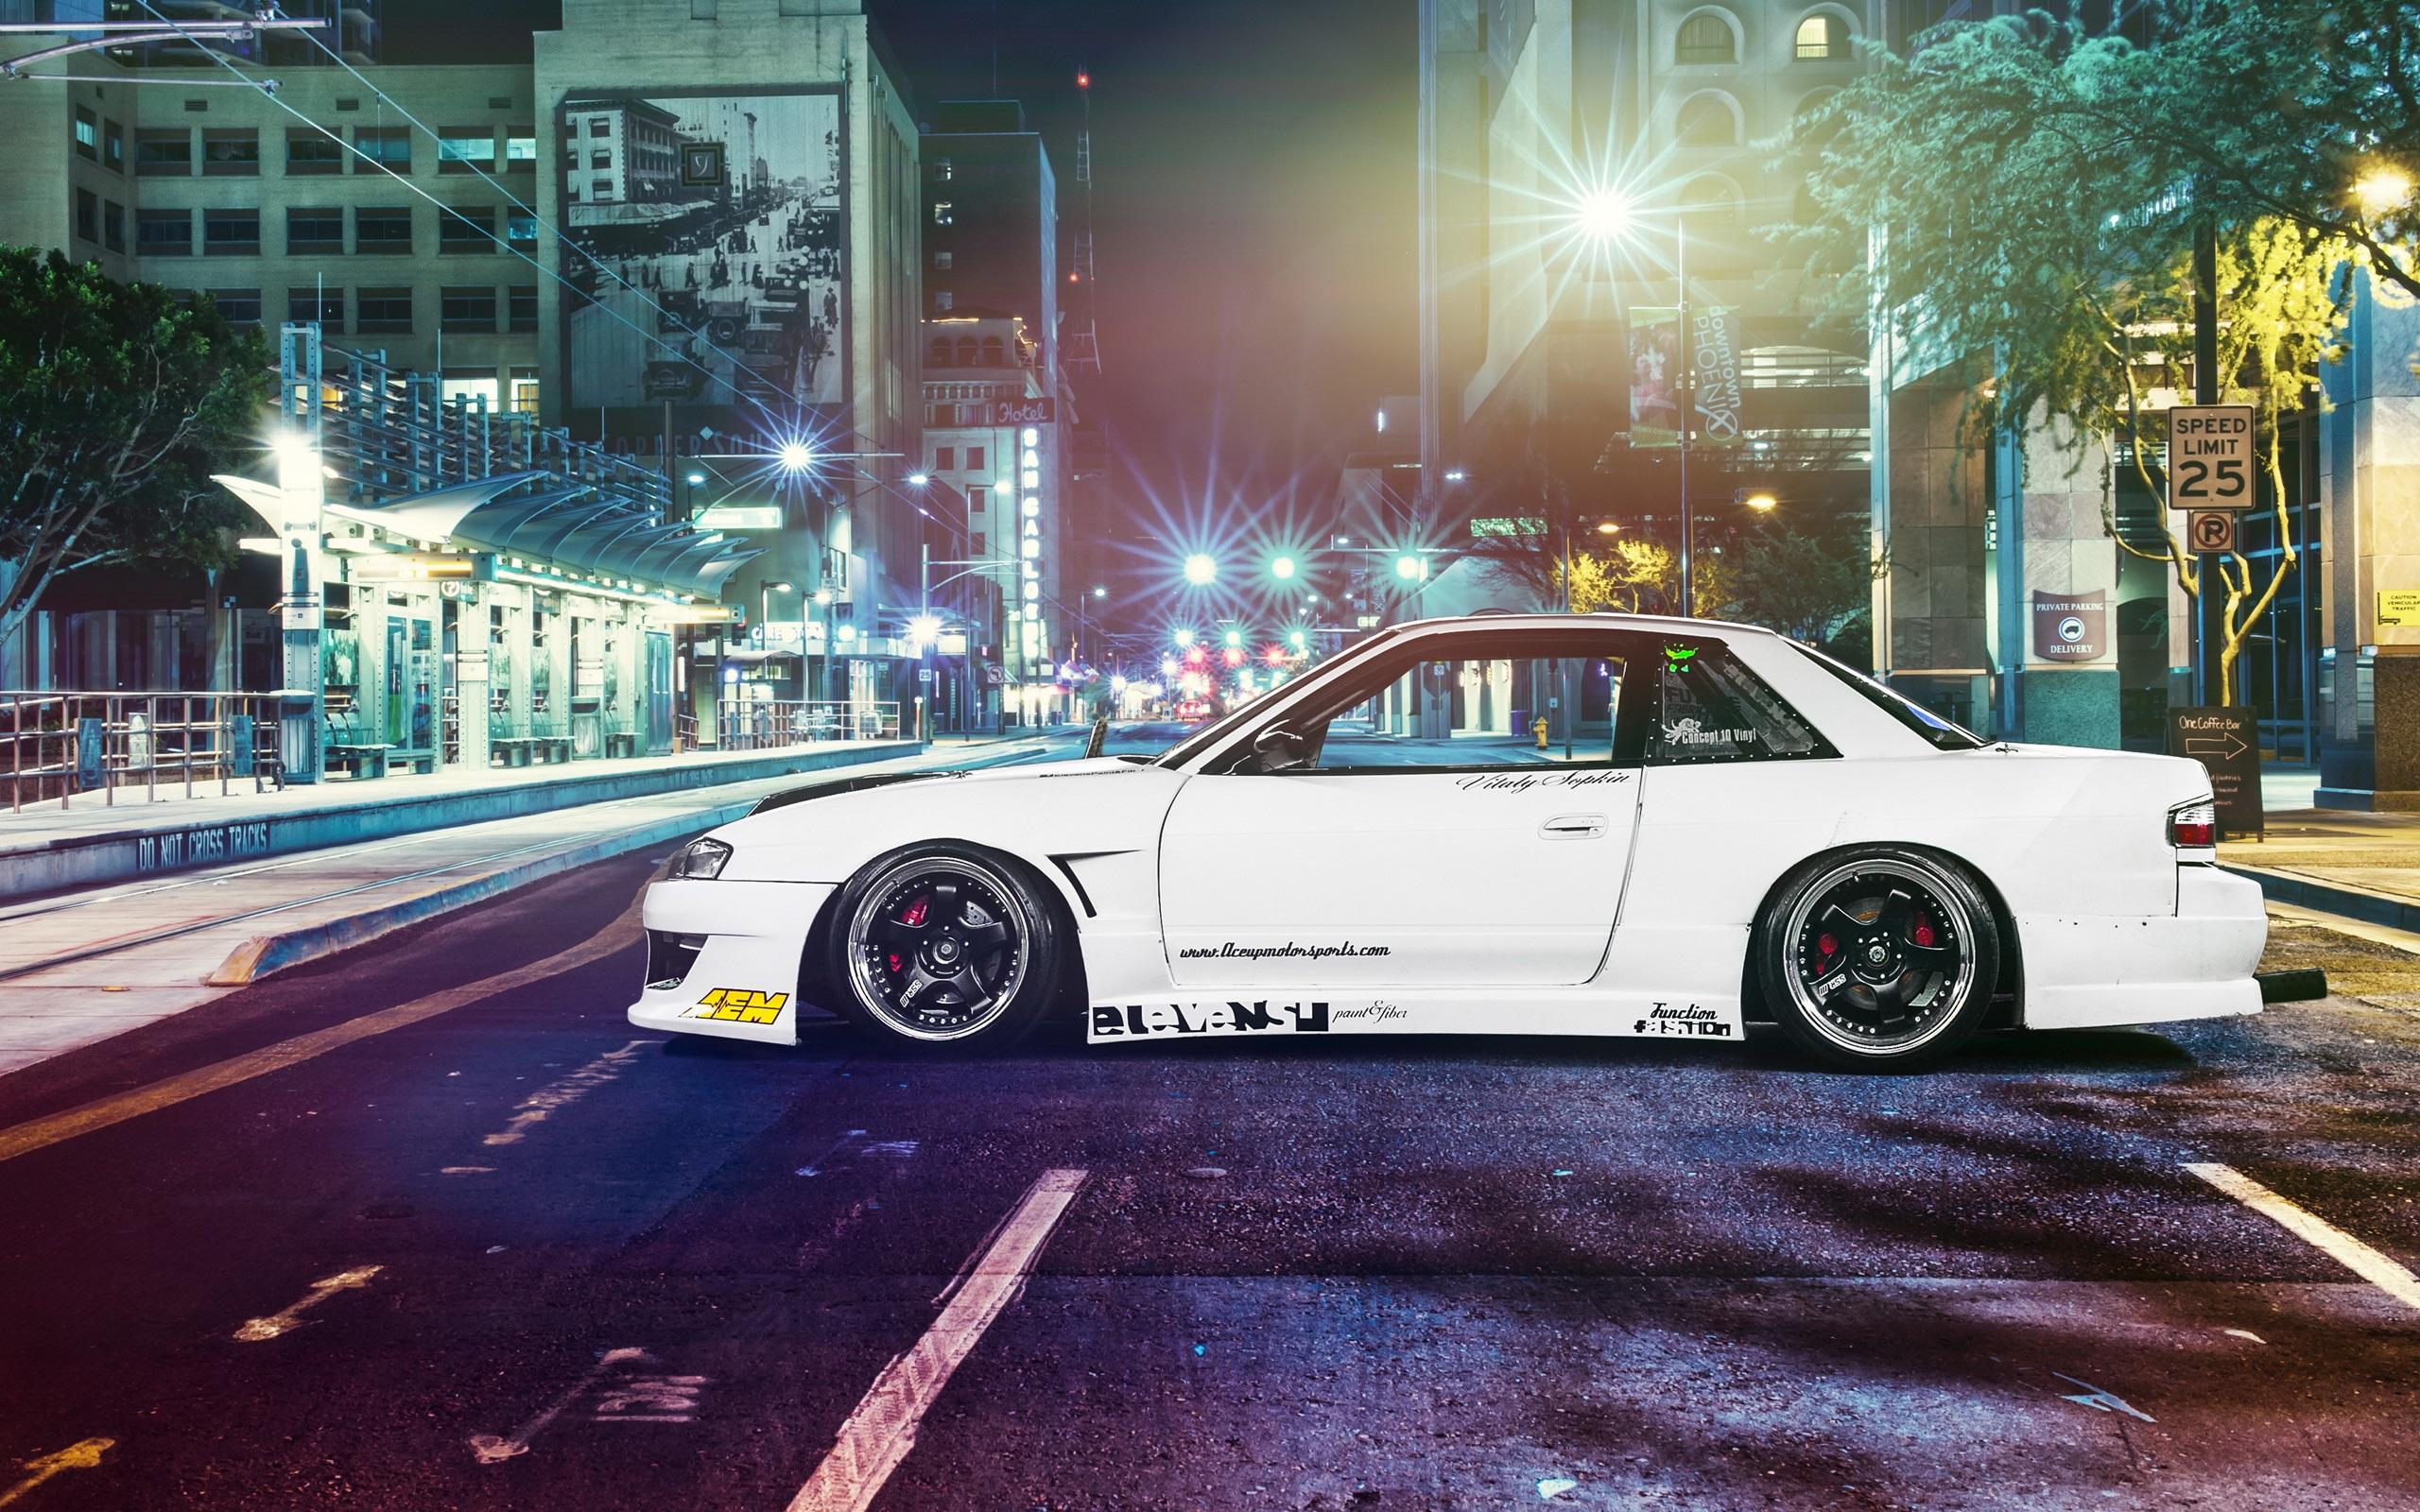 Wallpaper Nissan Silvia S13 Car Street Night 2560x1600 Hd Picture Image